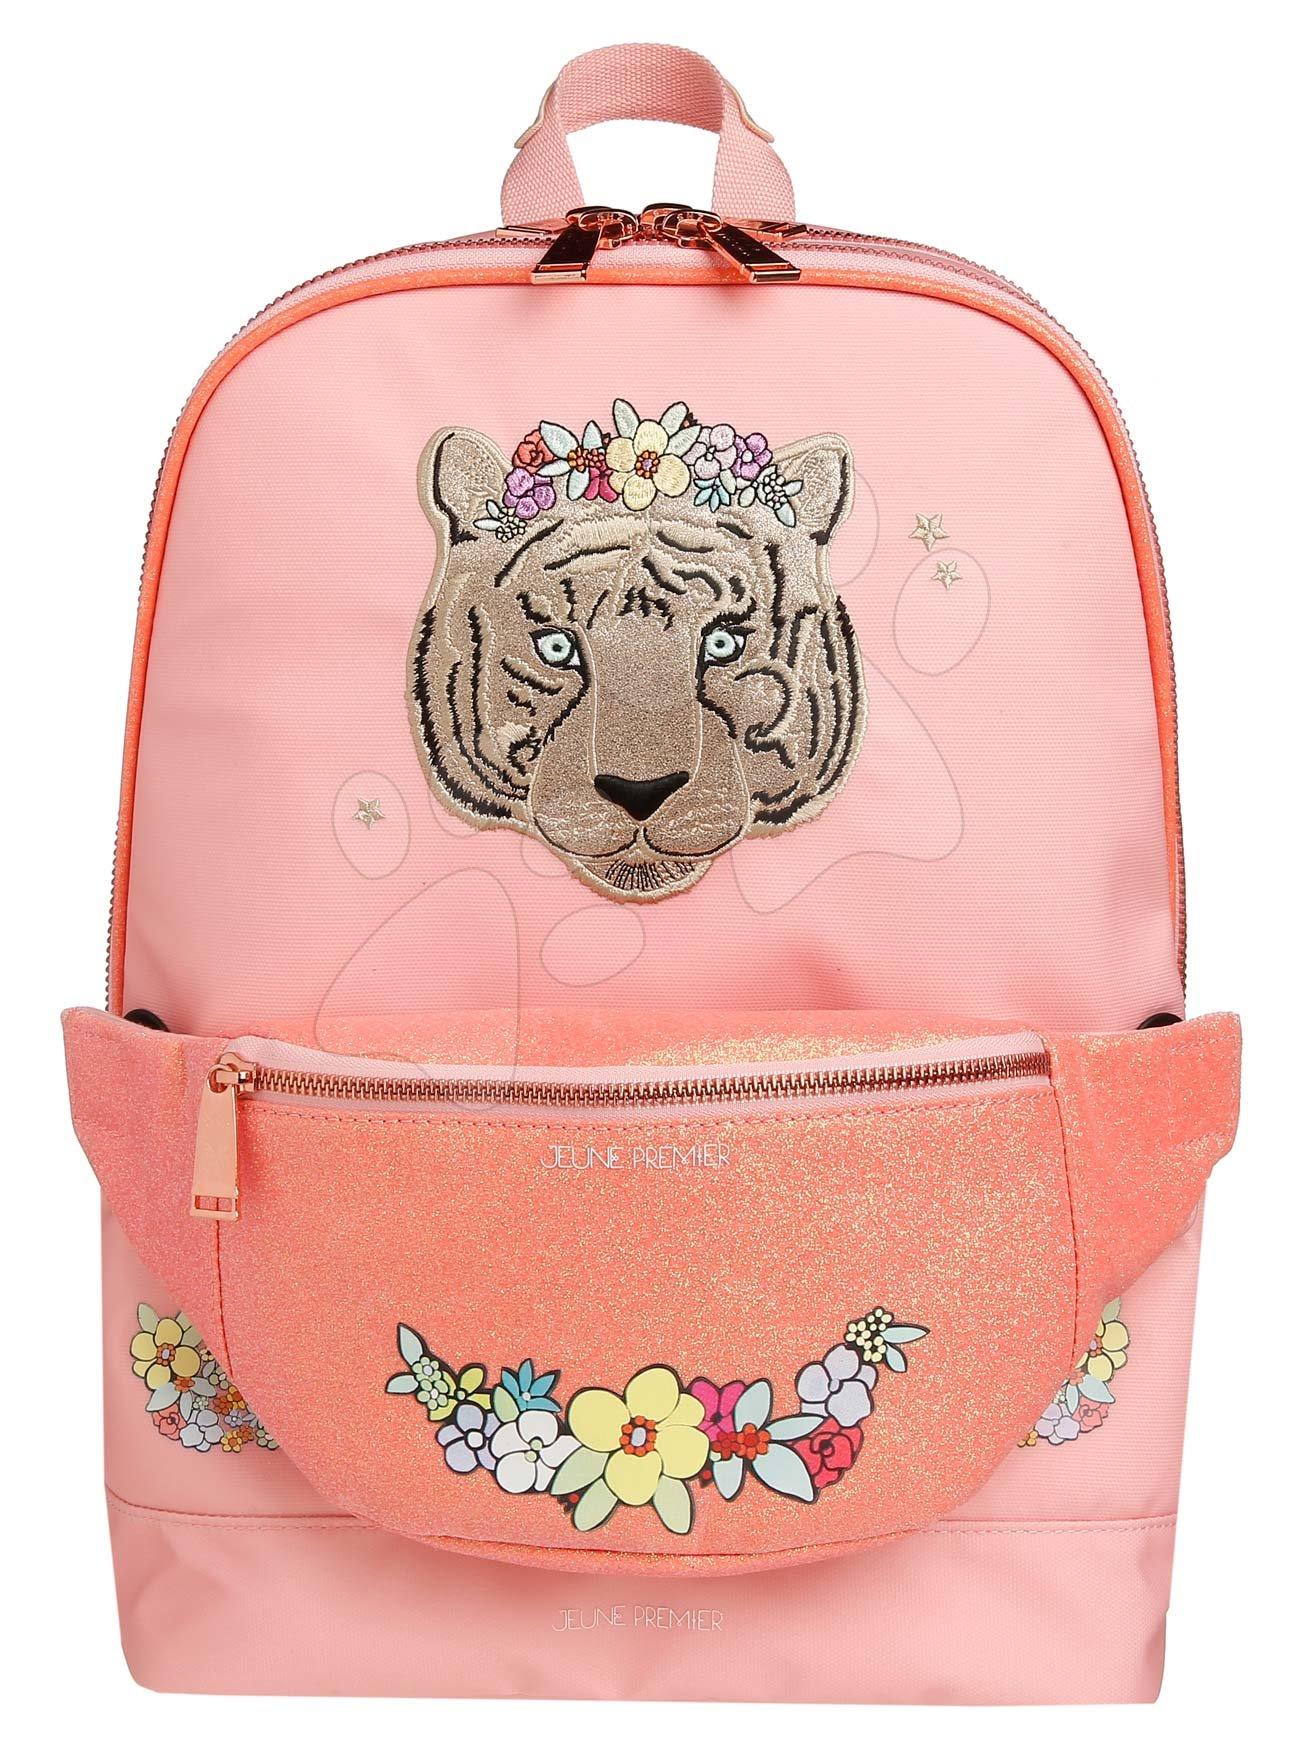 Školske torbe i ruksaci - Školská taška batoh Backpack Jackie Tiara Tiger Jeune Premier ergonomický luxusné prevedenie 39*27 cm JPBF021177